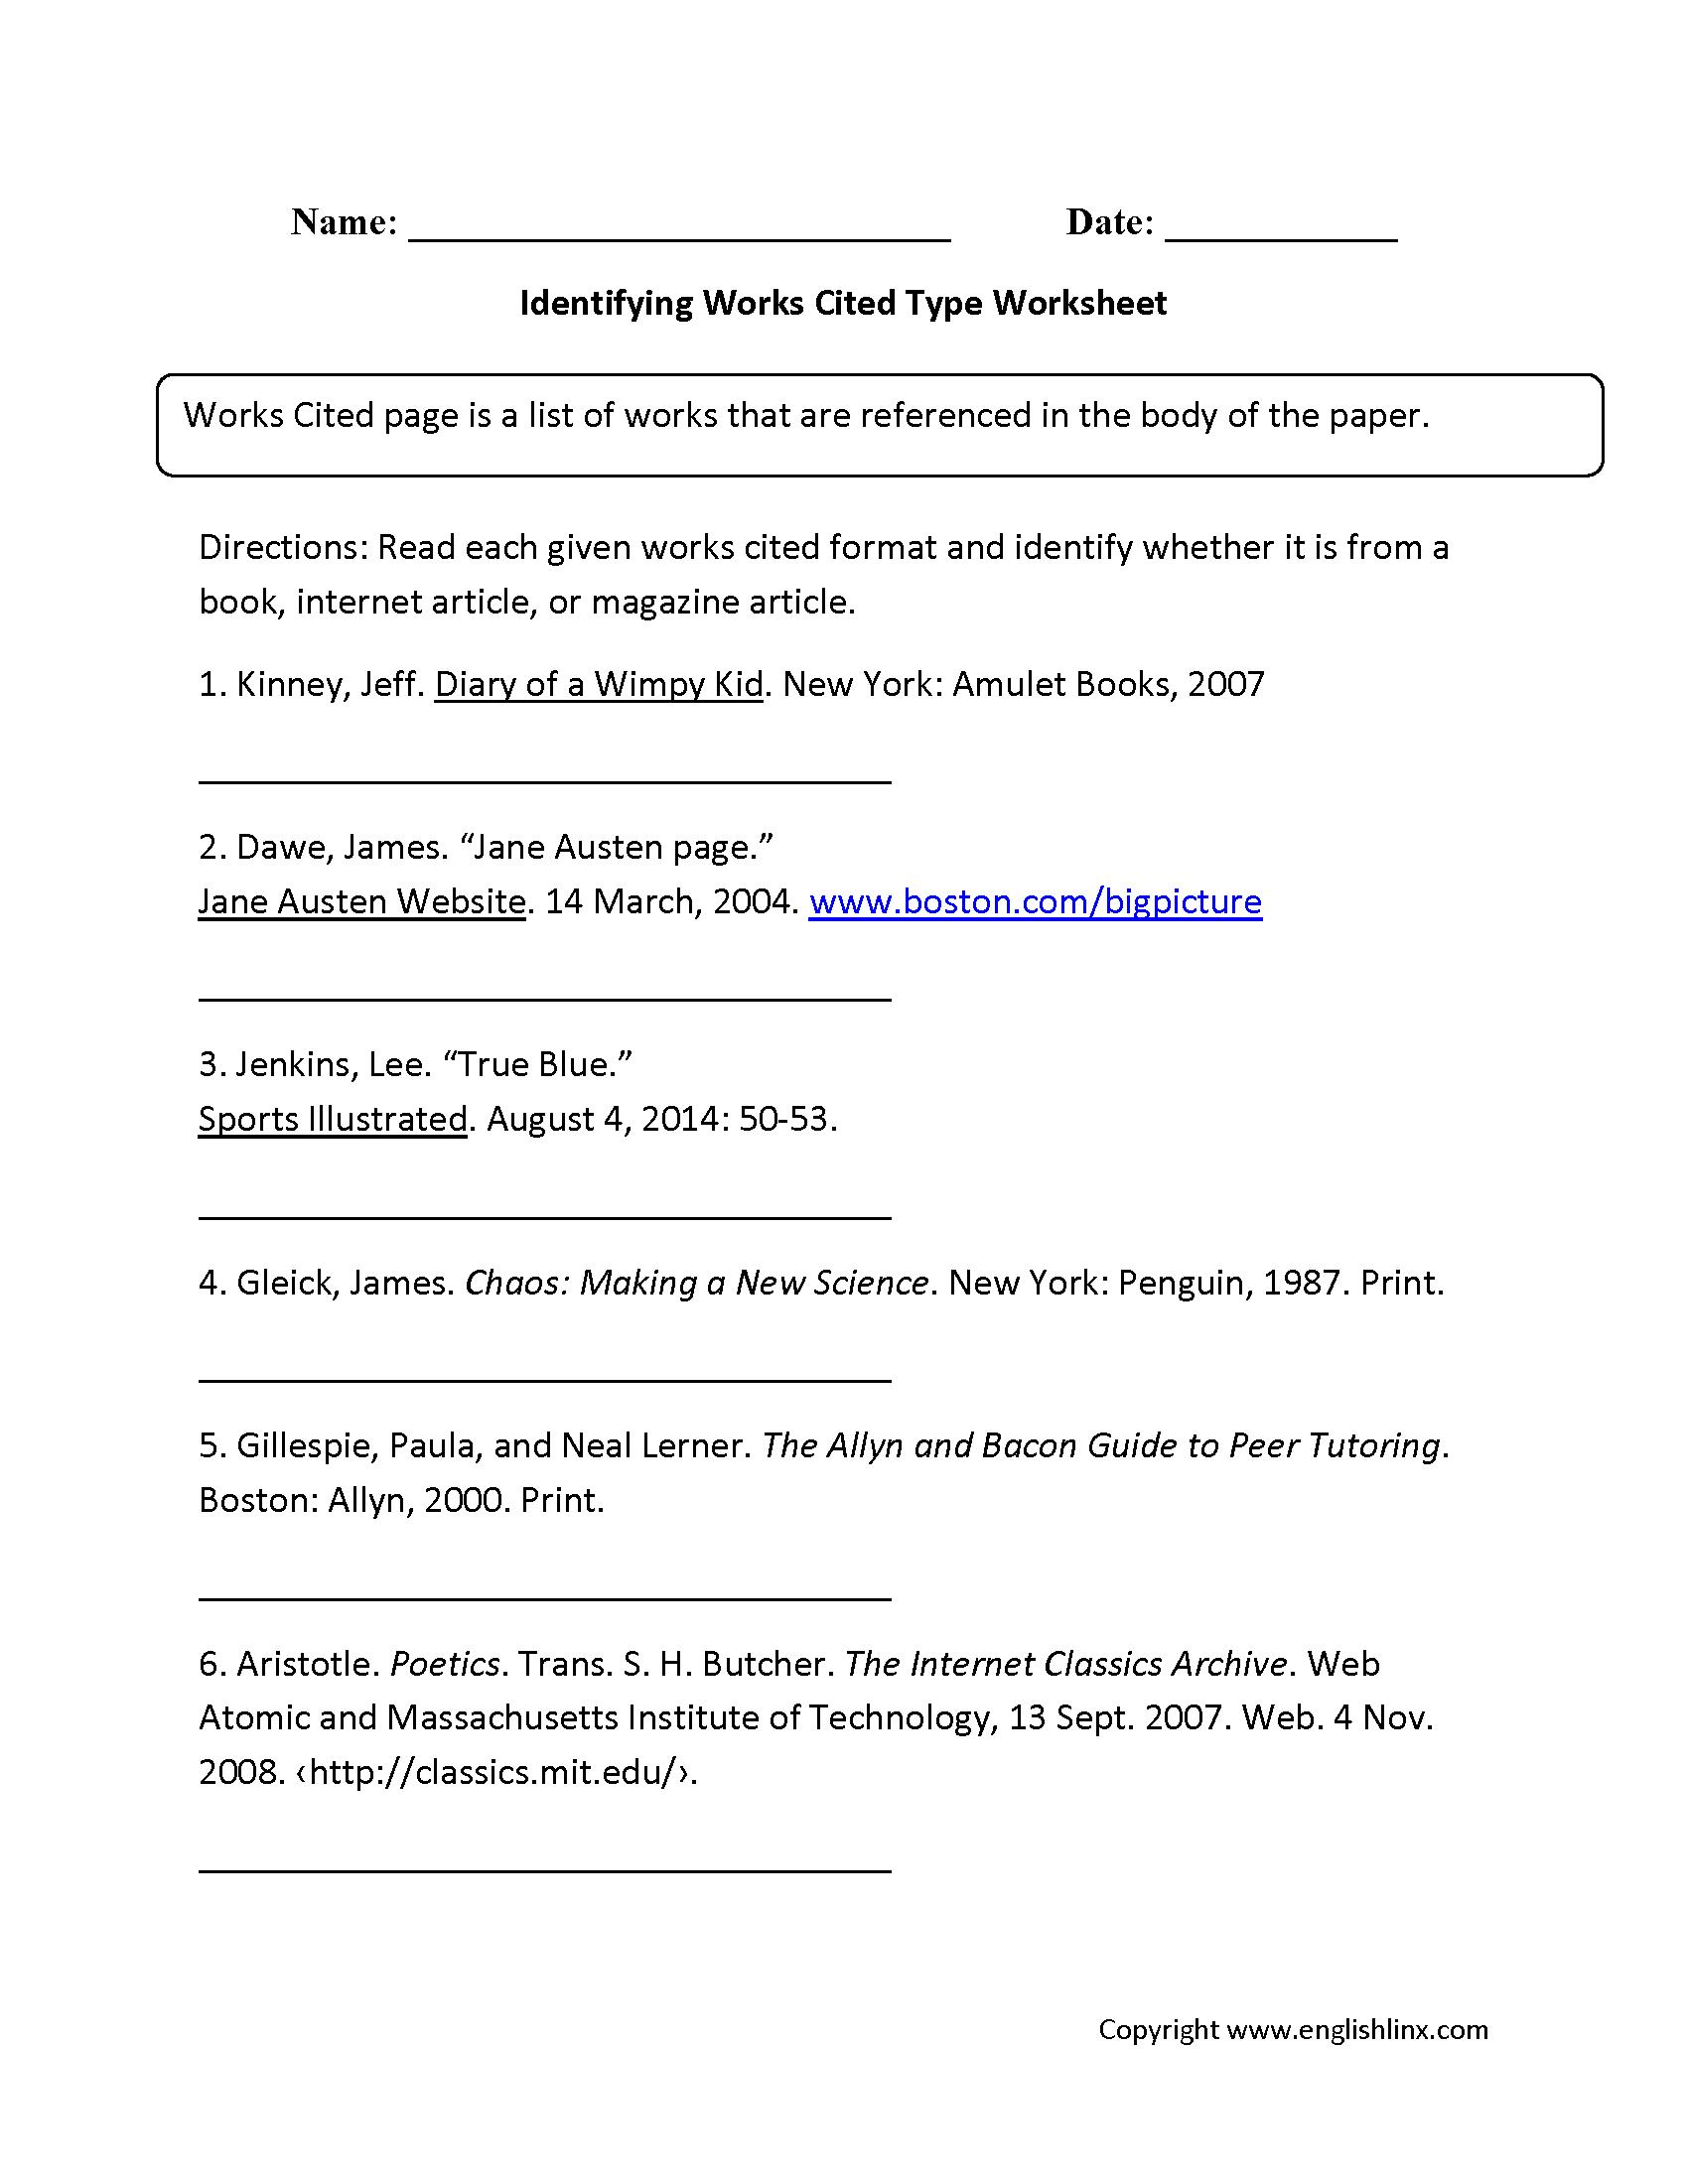 Identifying Works Cited Worksheets